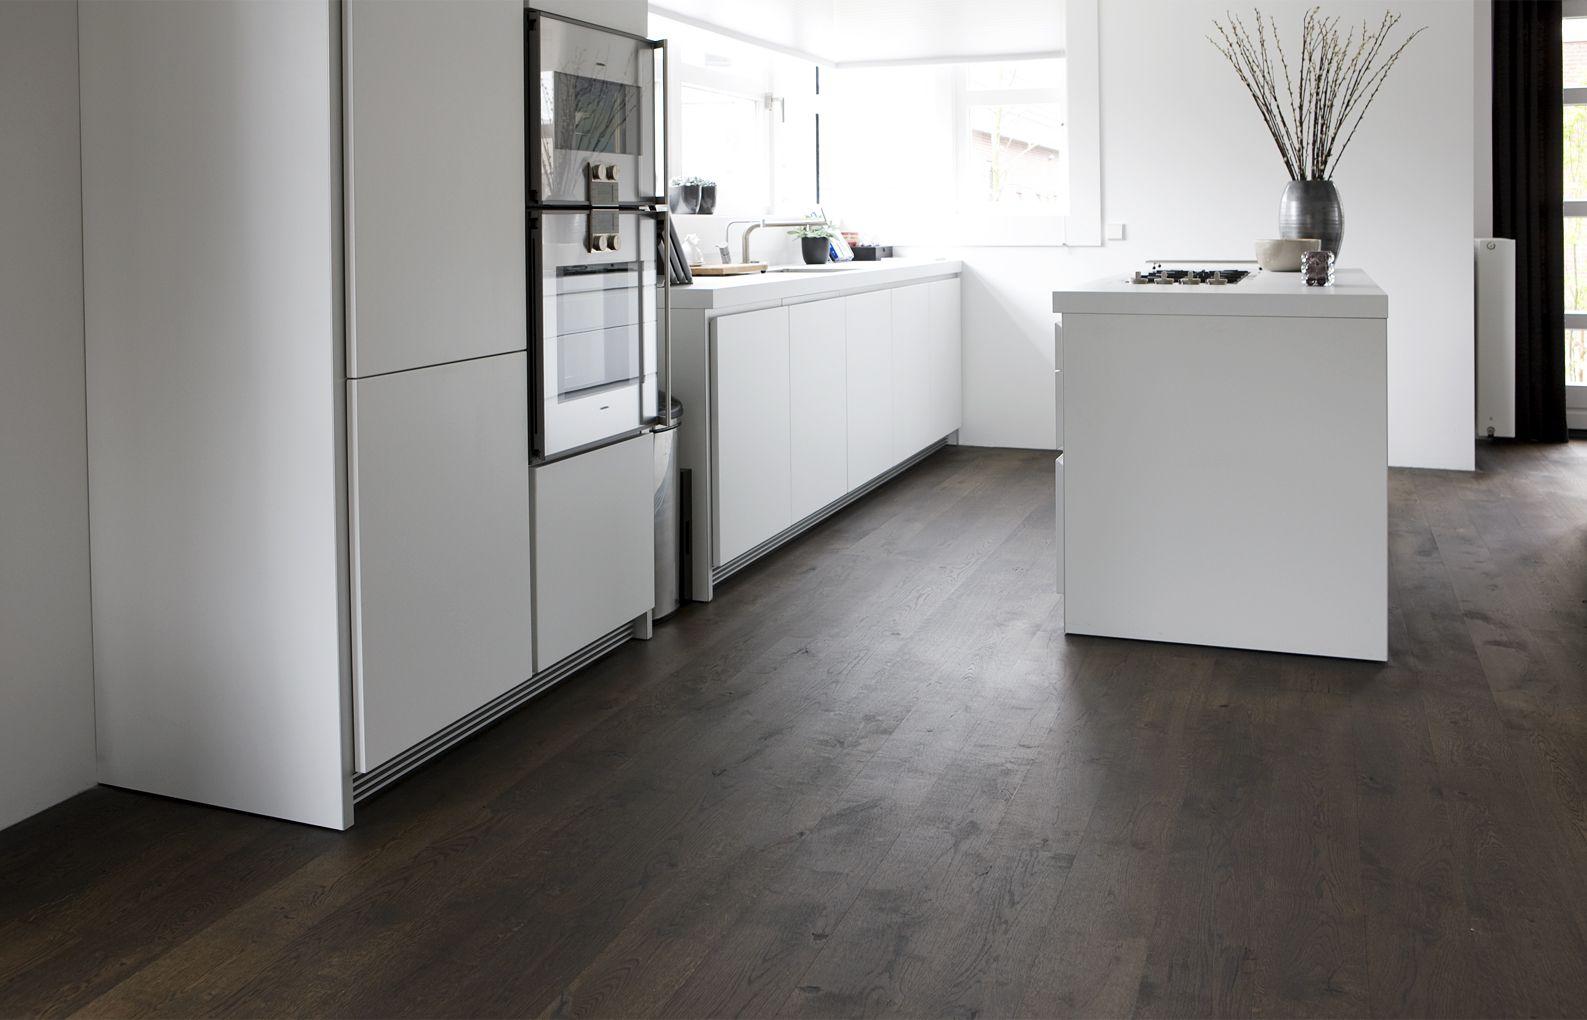 Houten vloer in de keuken uipkes rustiek frans eiken houten vloer